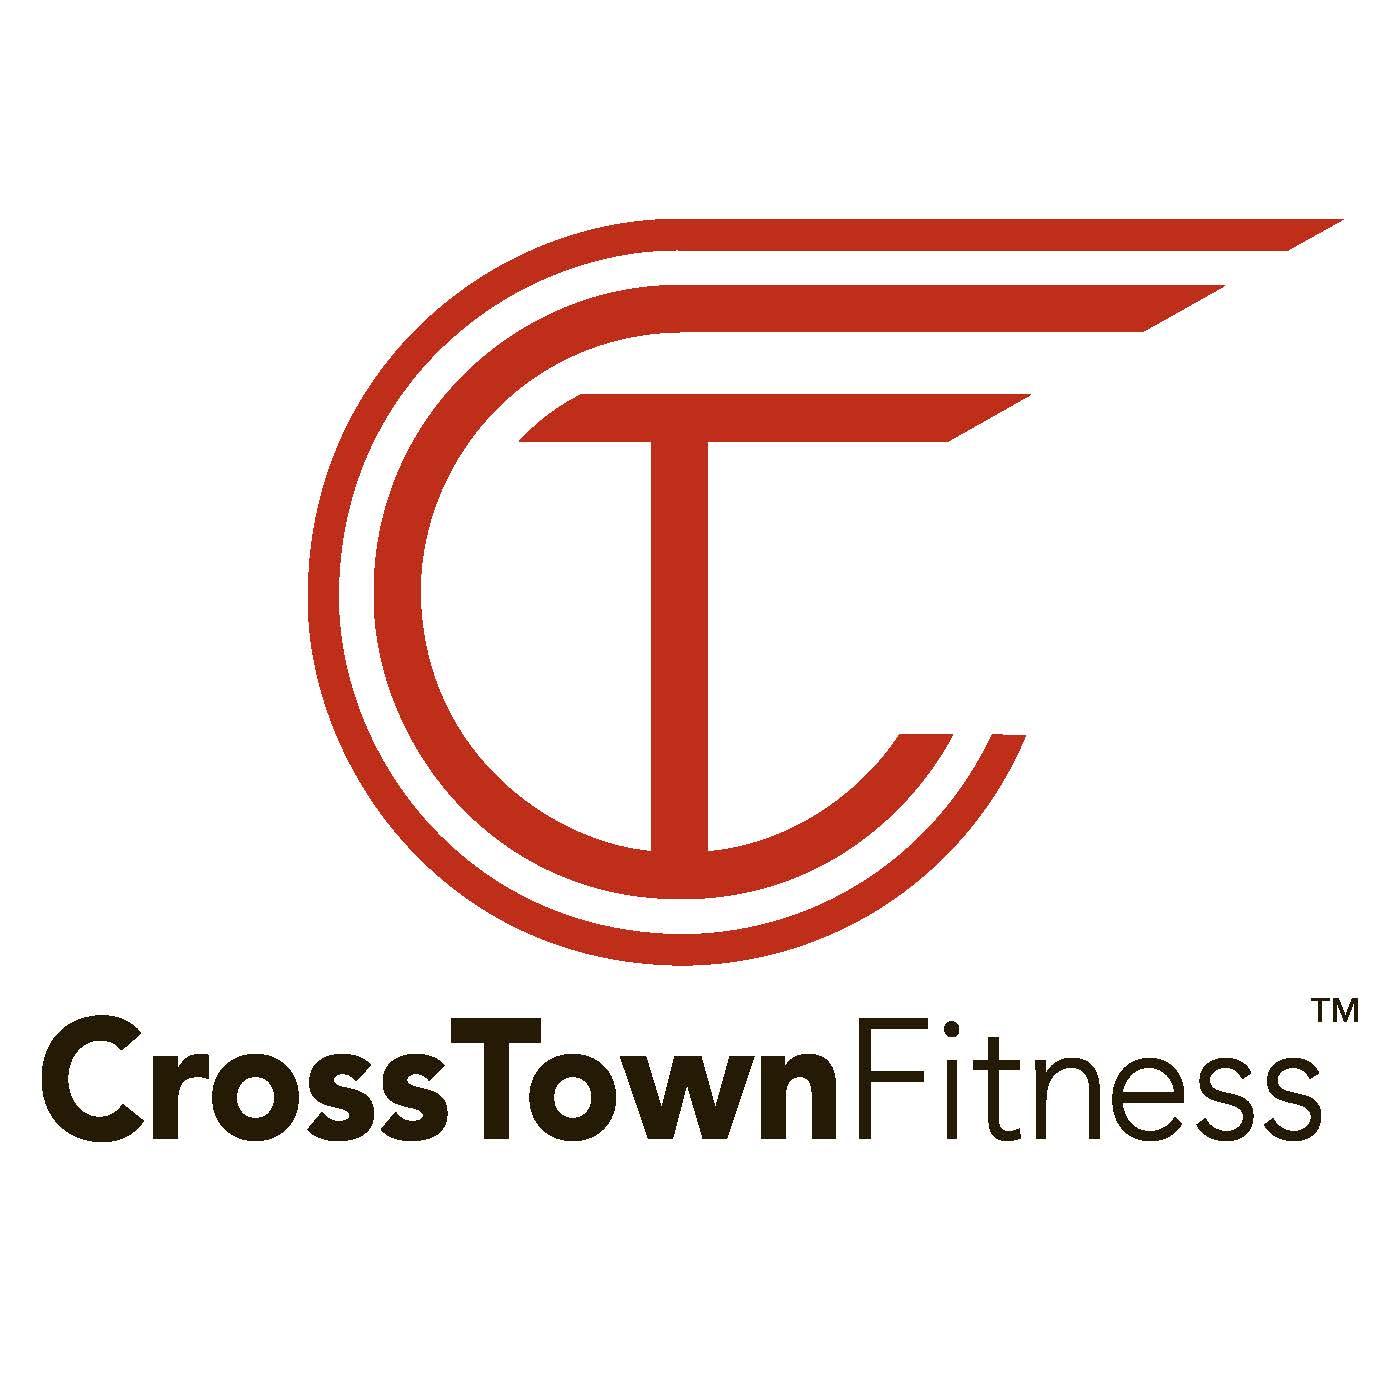 CTF_Official_Logo_Red&Black.jpg